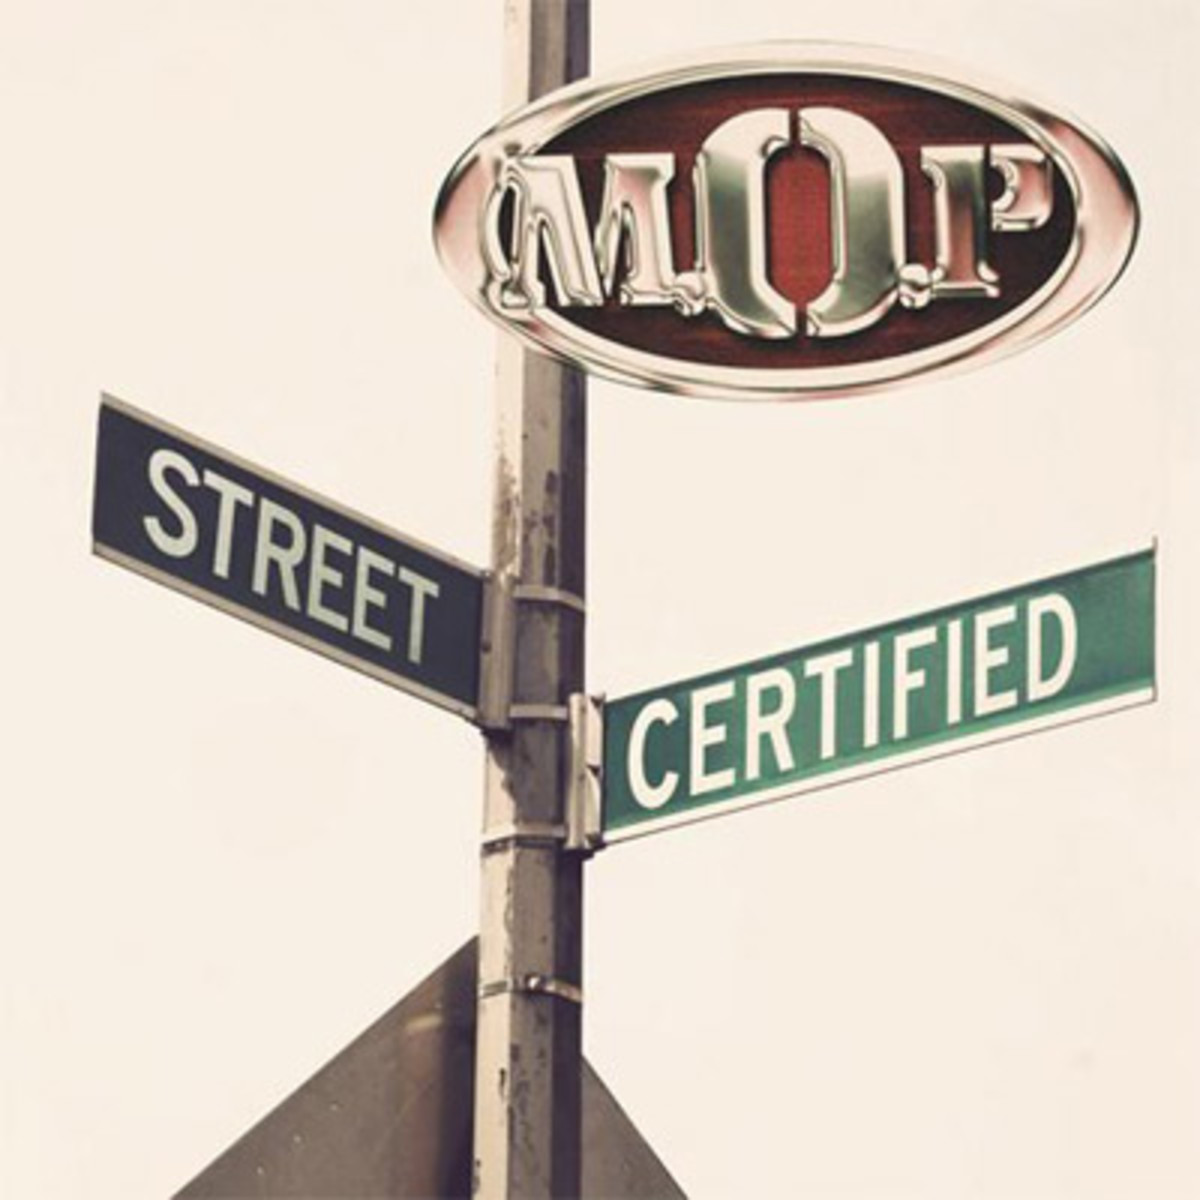 mop-streetcertified.jpg